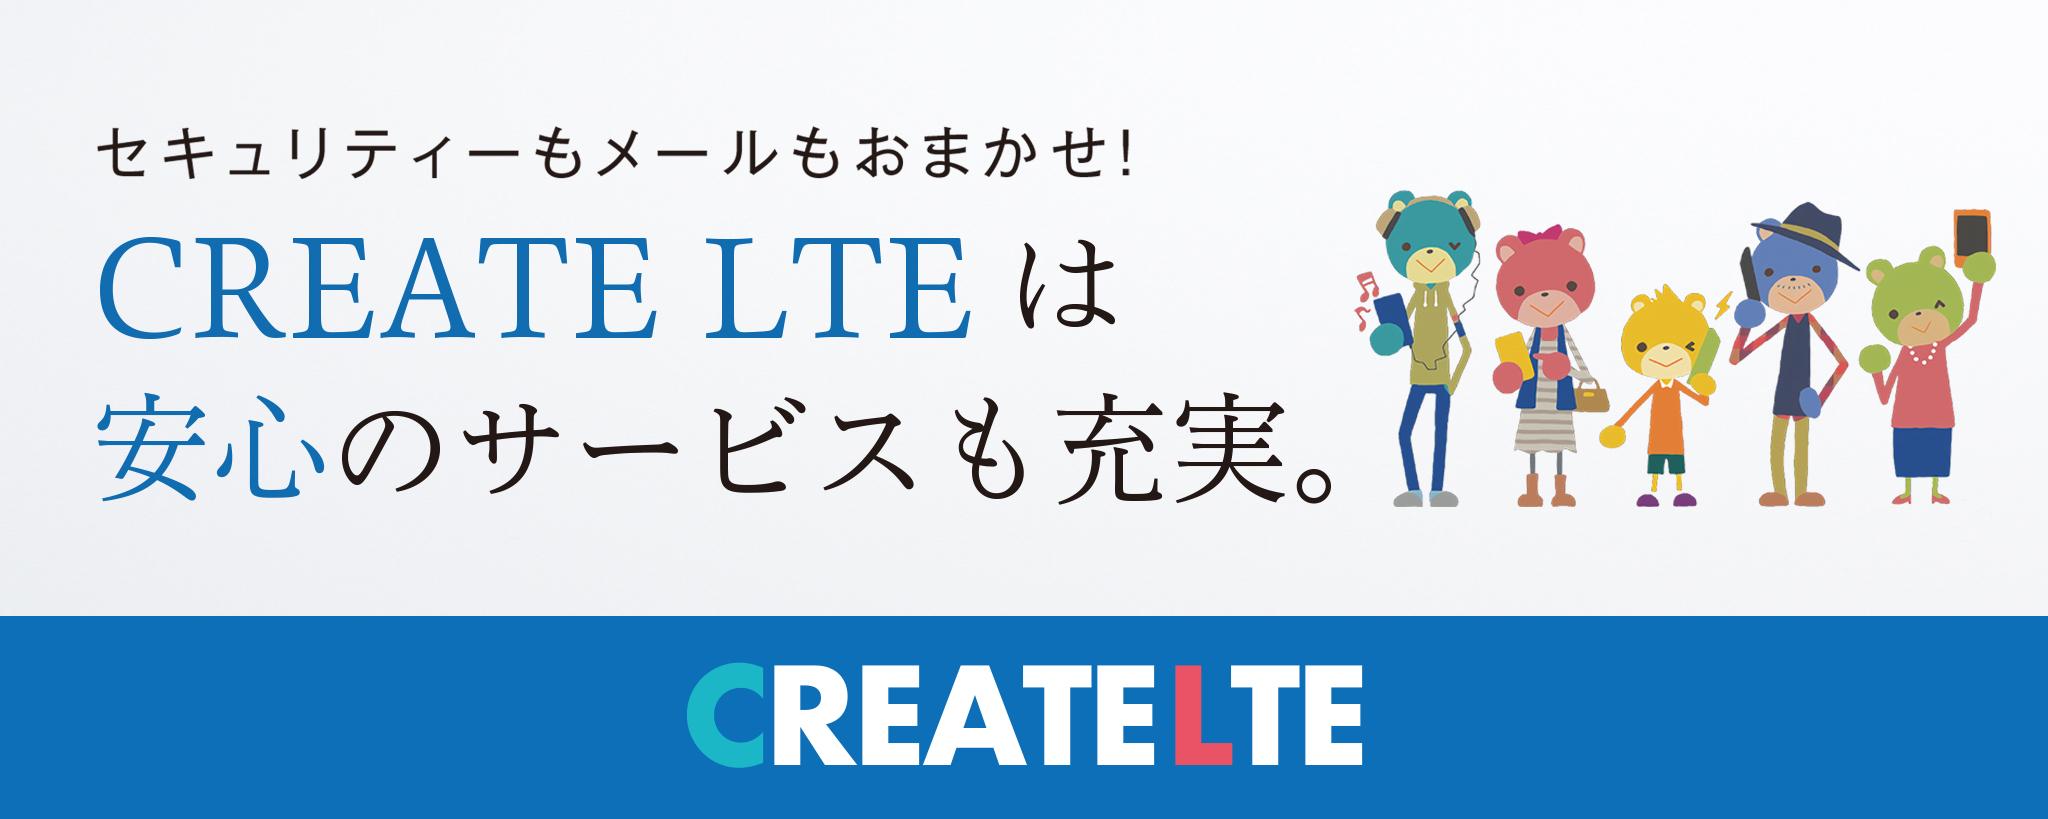 CREATE LTE 安心のサービス